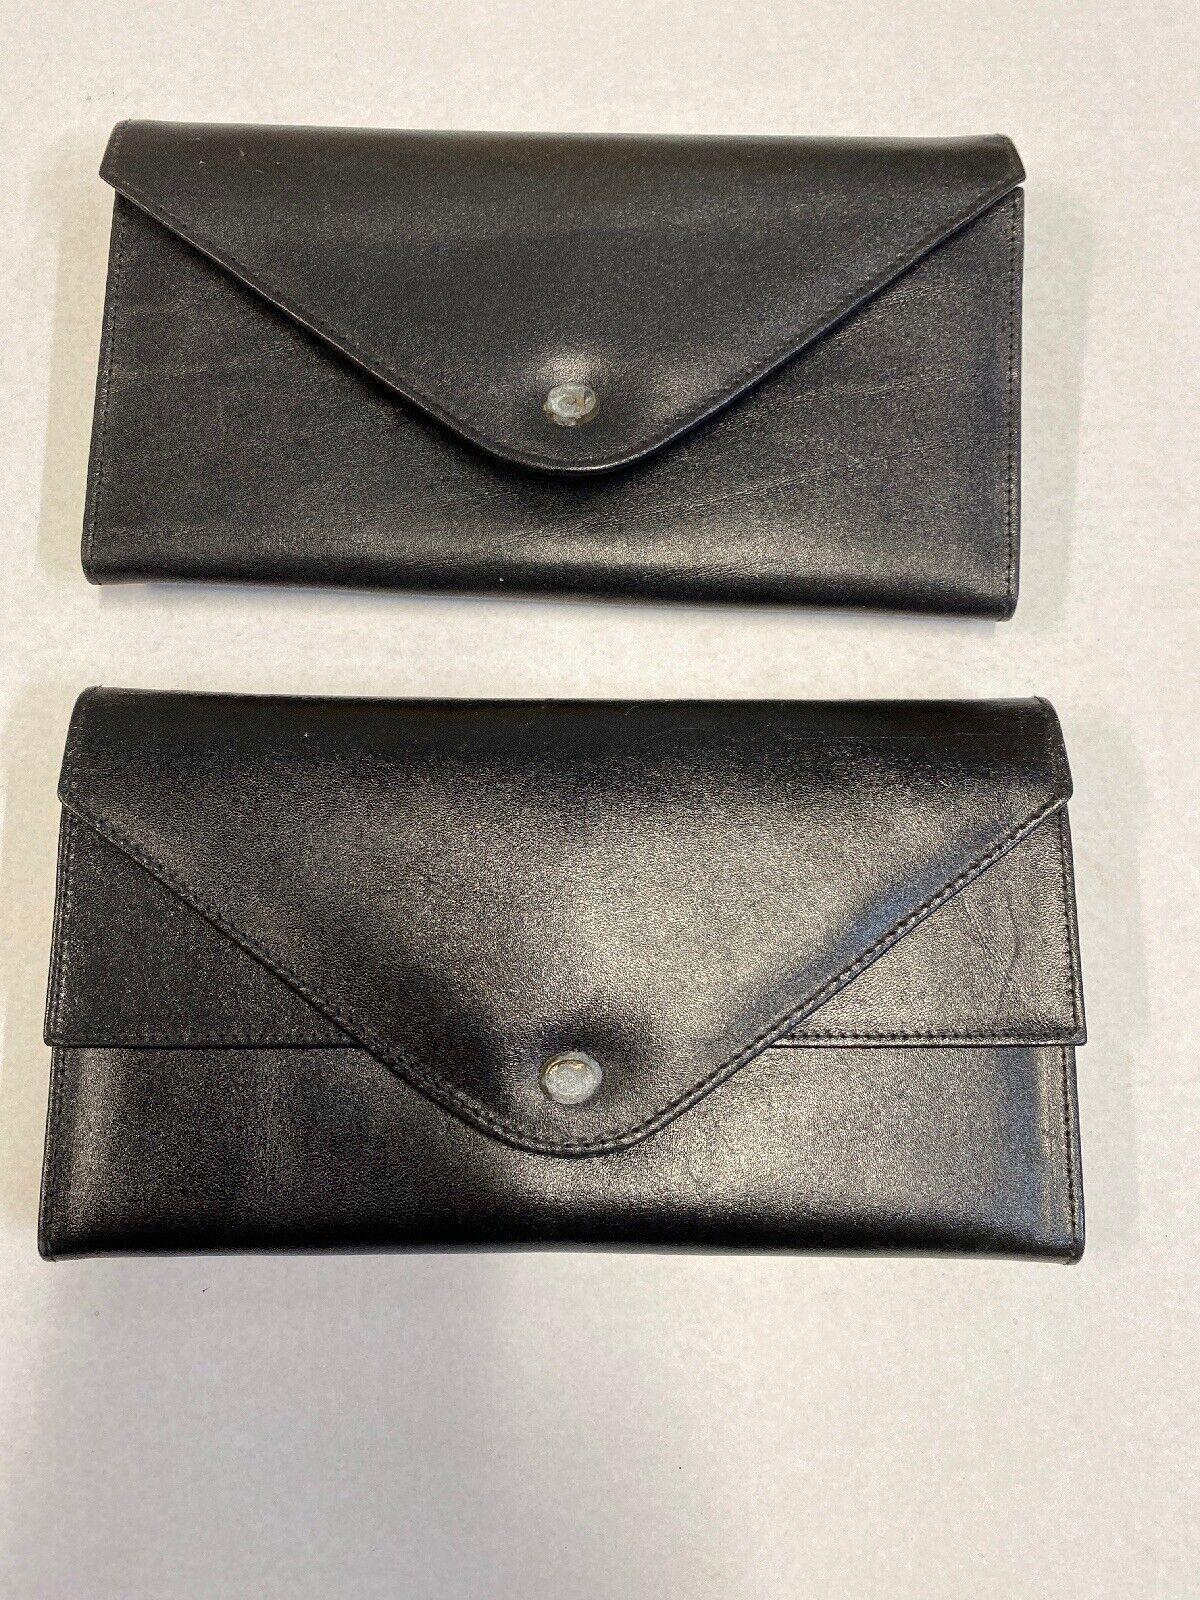 ( 2 ) Vintage Black Leather Wallet from Estate UnCleaned